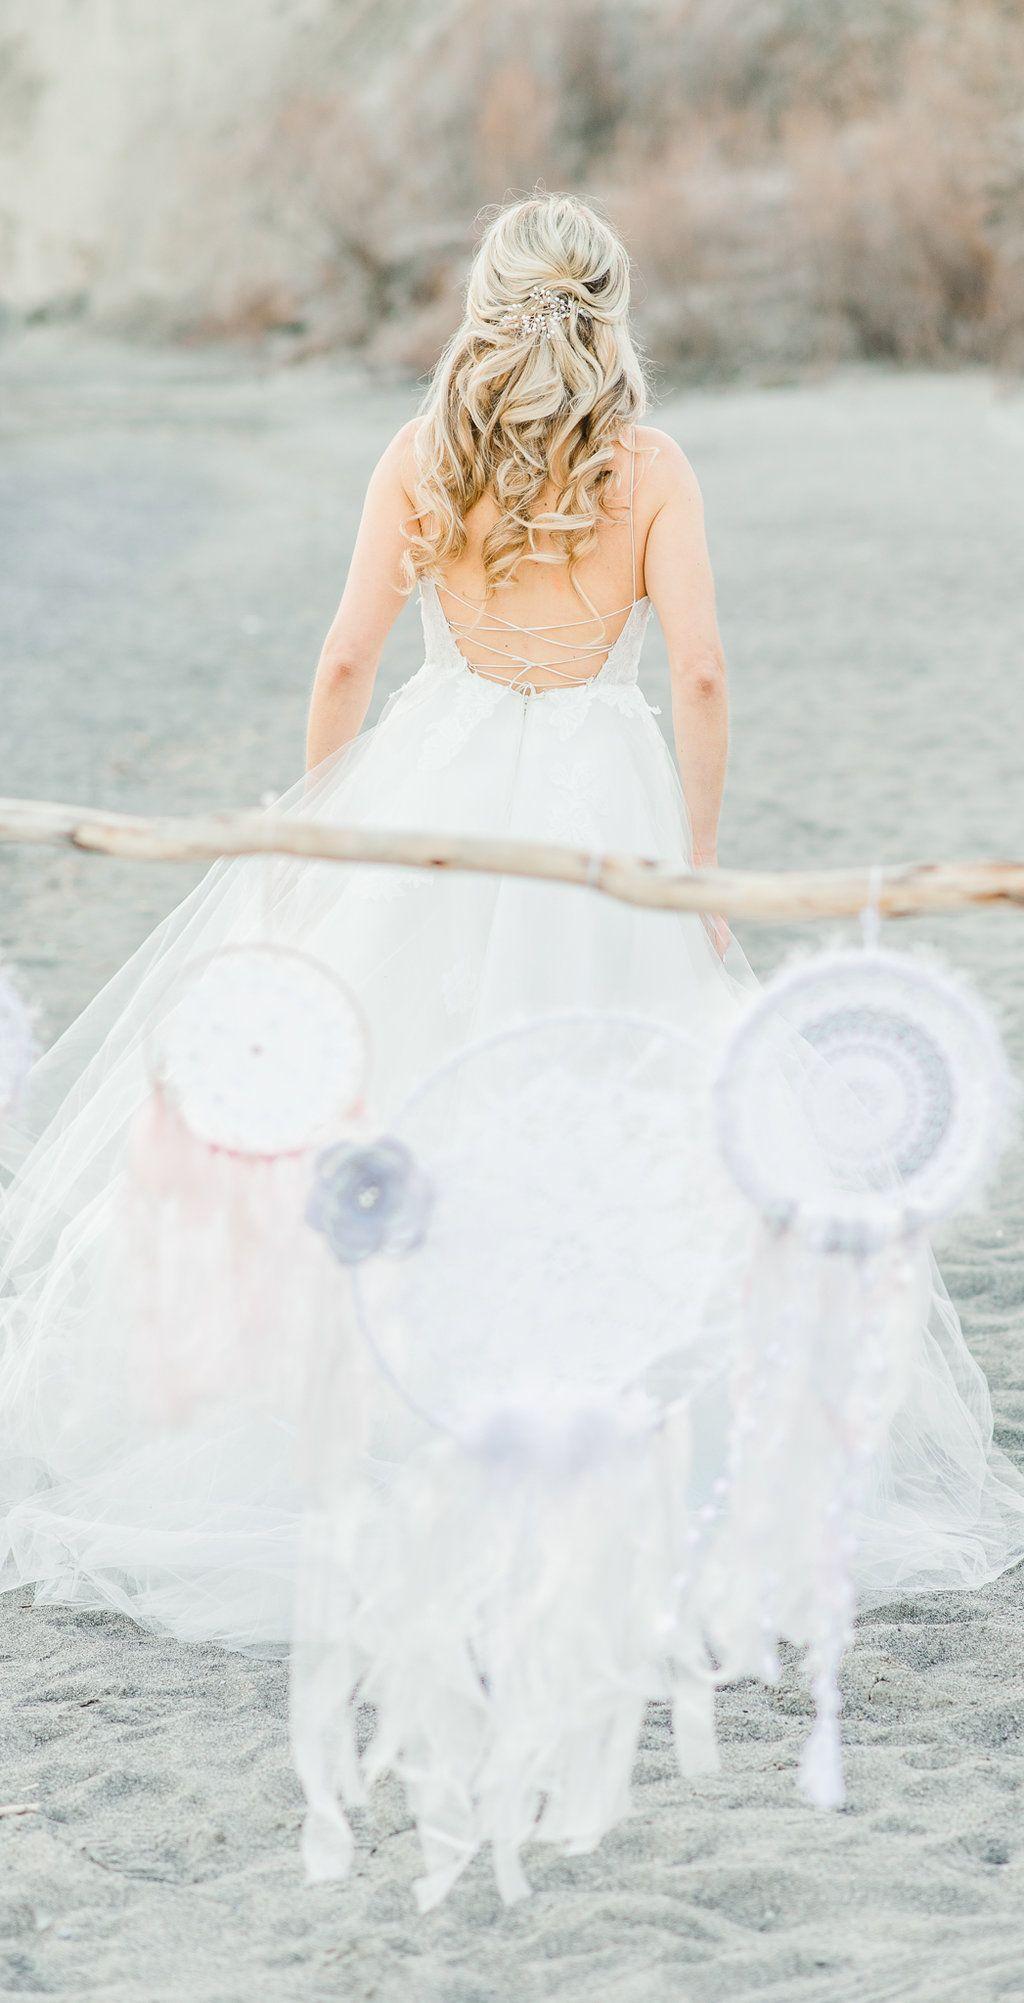 47f304aed0 Dreamy Boho Beach Wedding with Dreamcatchers | Astrid & Mercedes Editorial  | Dress: Astrid & Mercedes Romance | photographer: Christine Grace  Photography ...